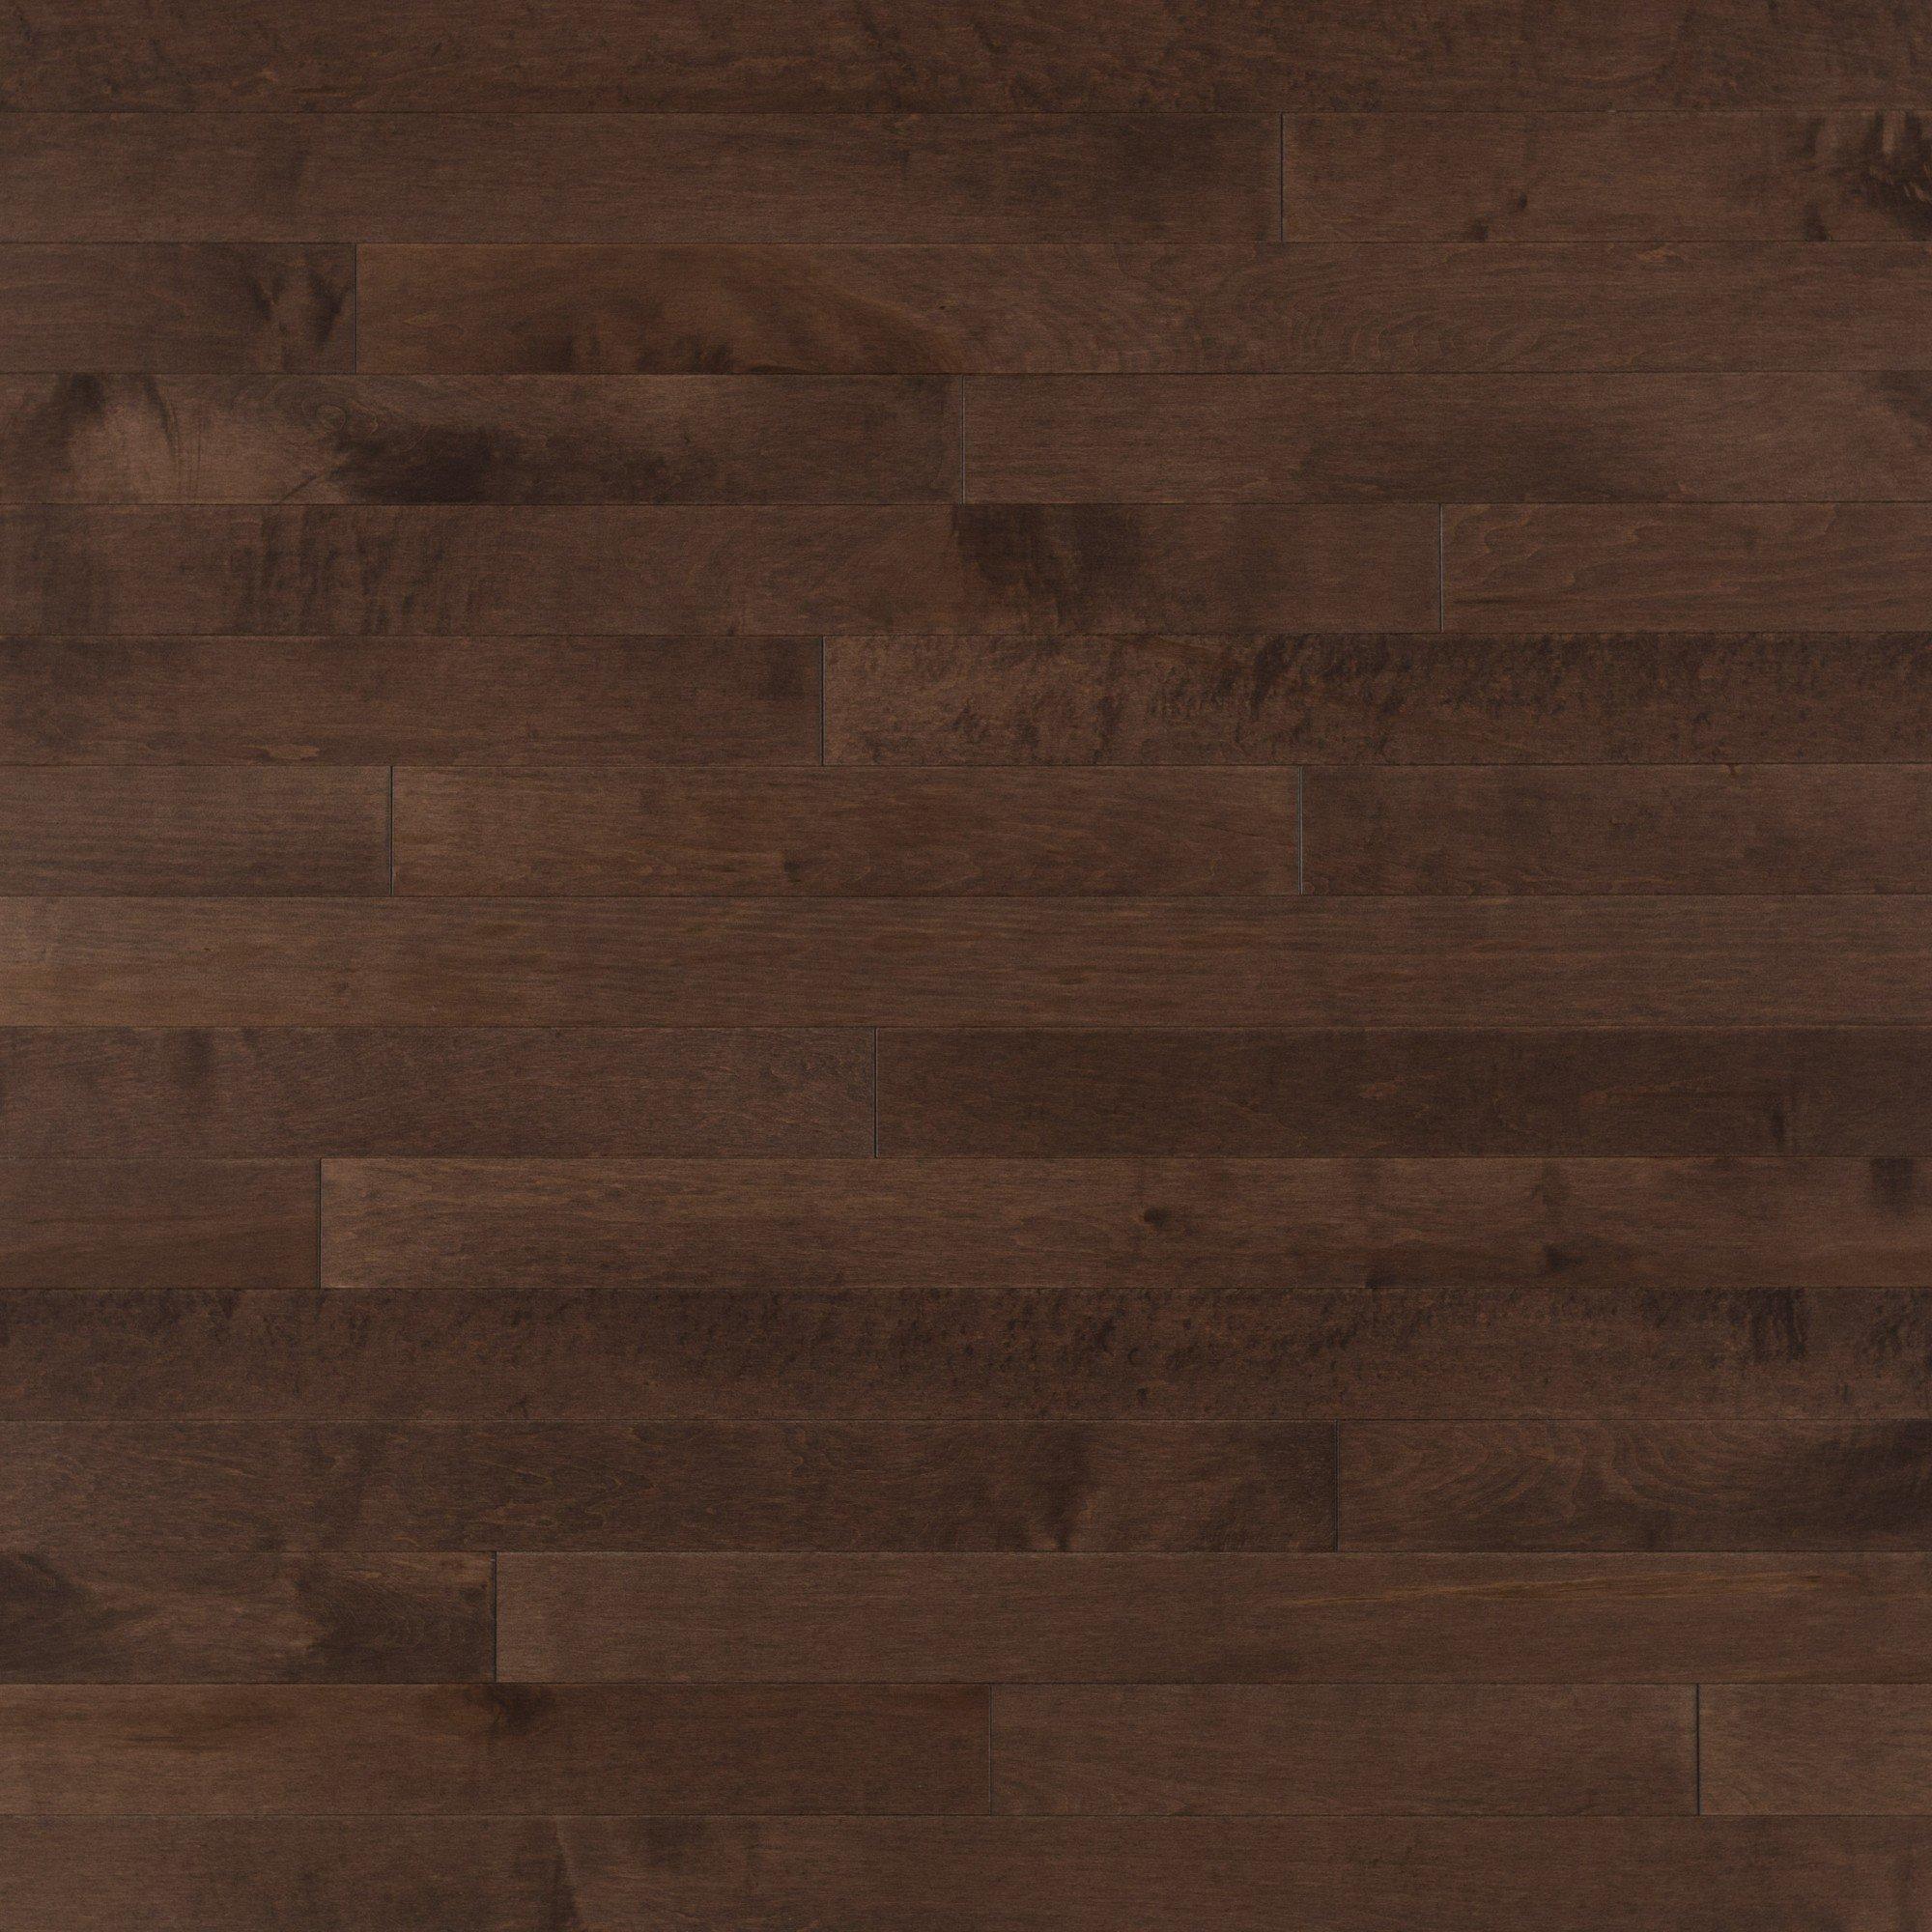 Admiration Maple Bolton Mirage Hardwood Floors